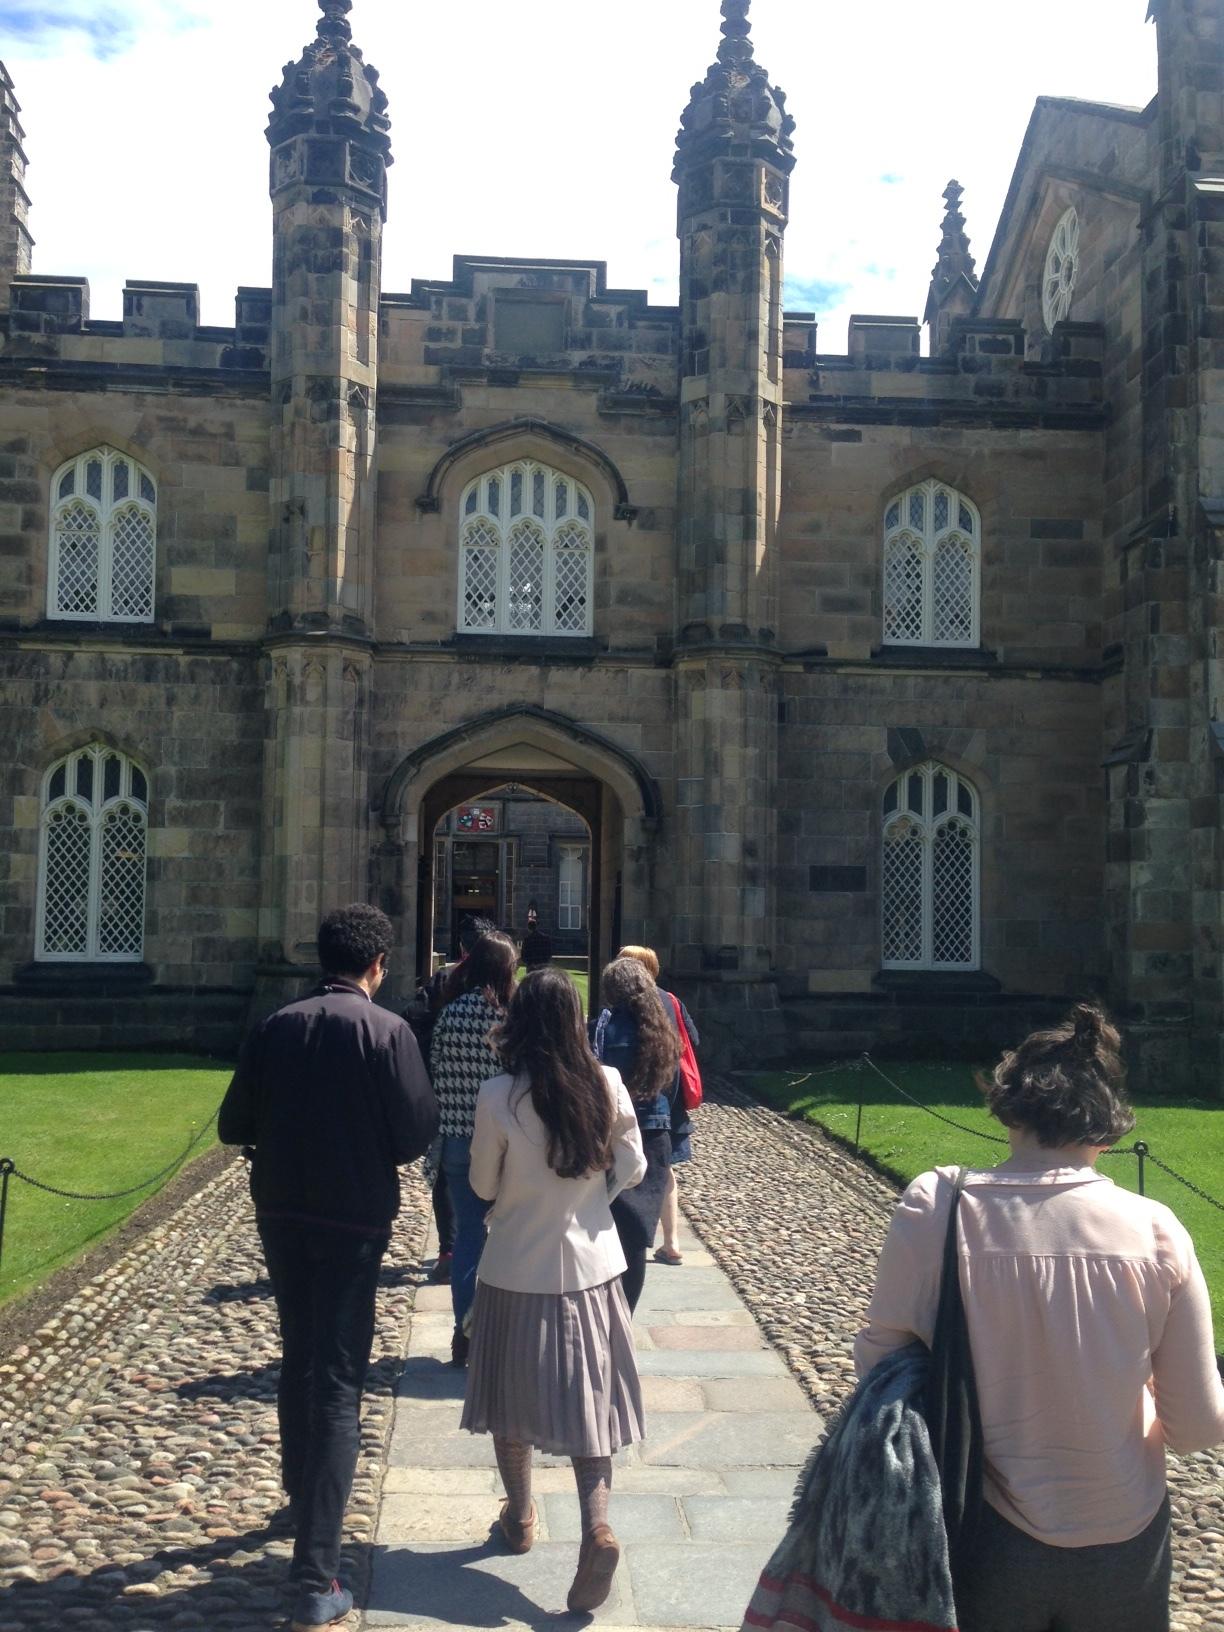 PHD students at Aberdeen University